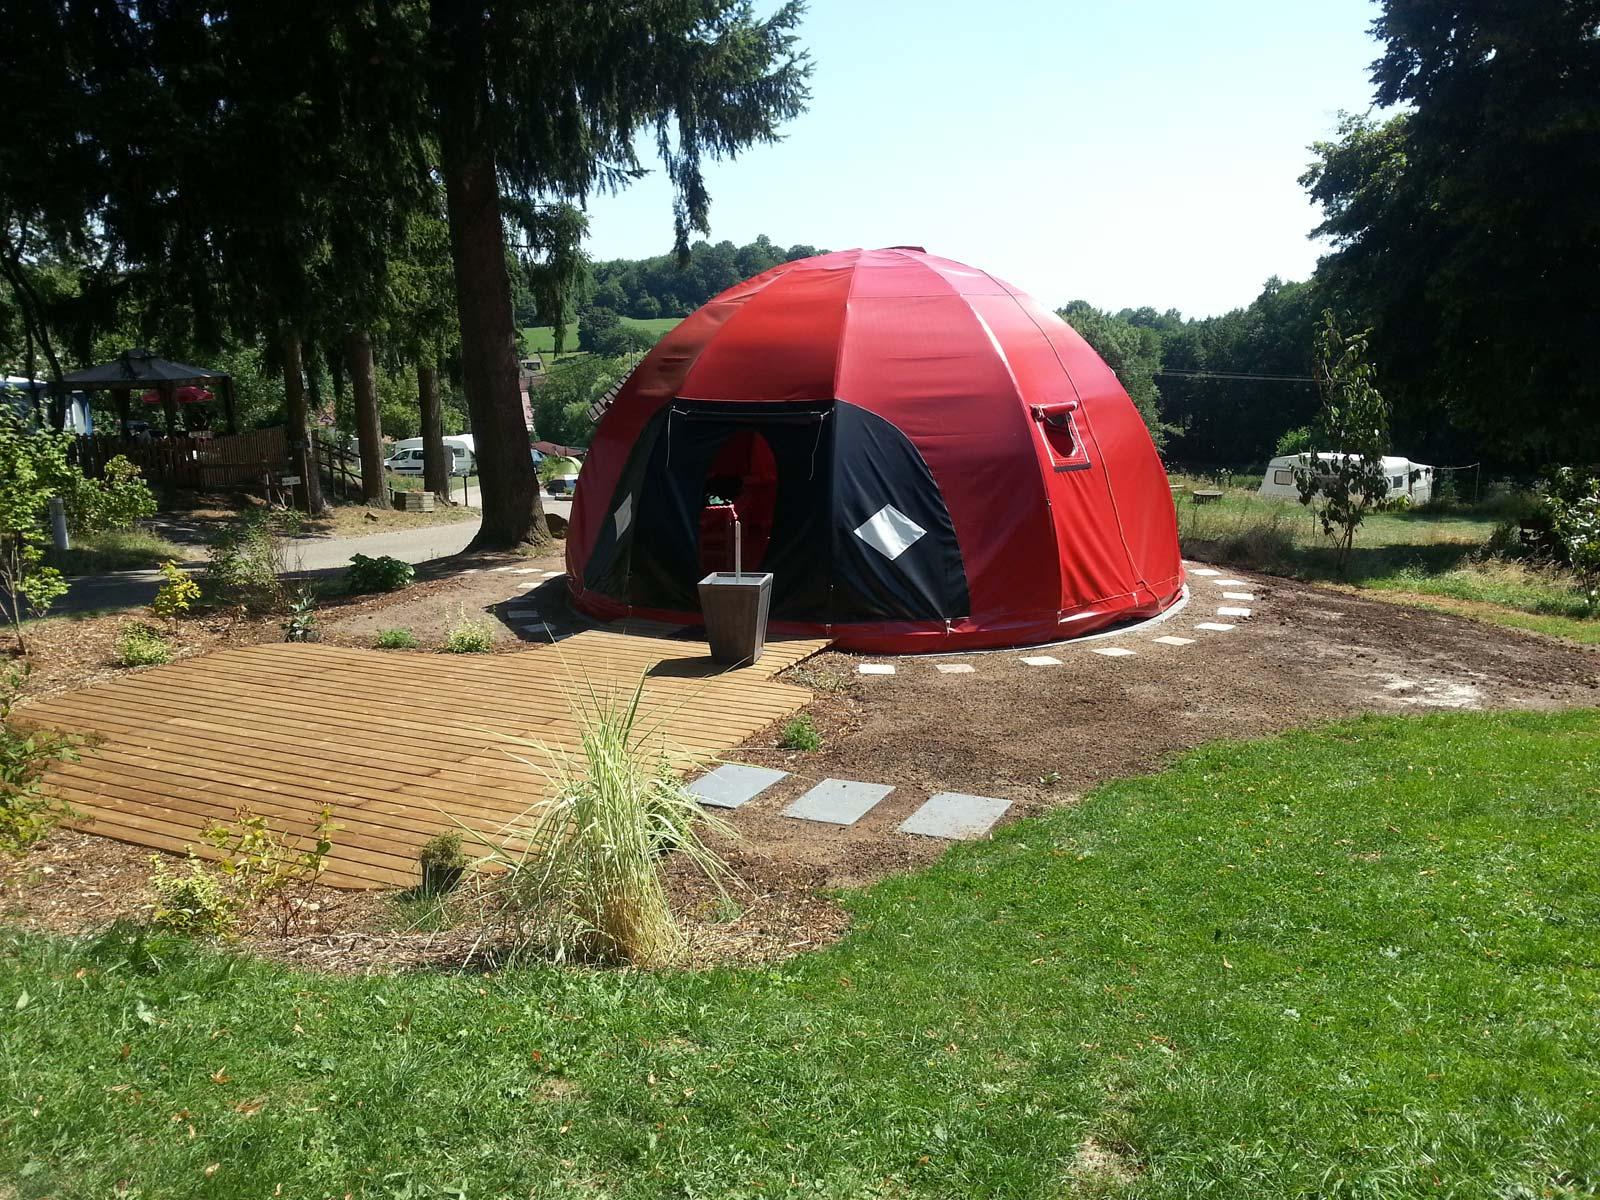 Tentes coccinelles wigwam, Camping Heidenkopf, Niederbronn-les-Bains, Alsace